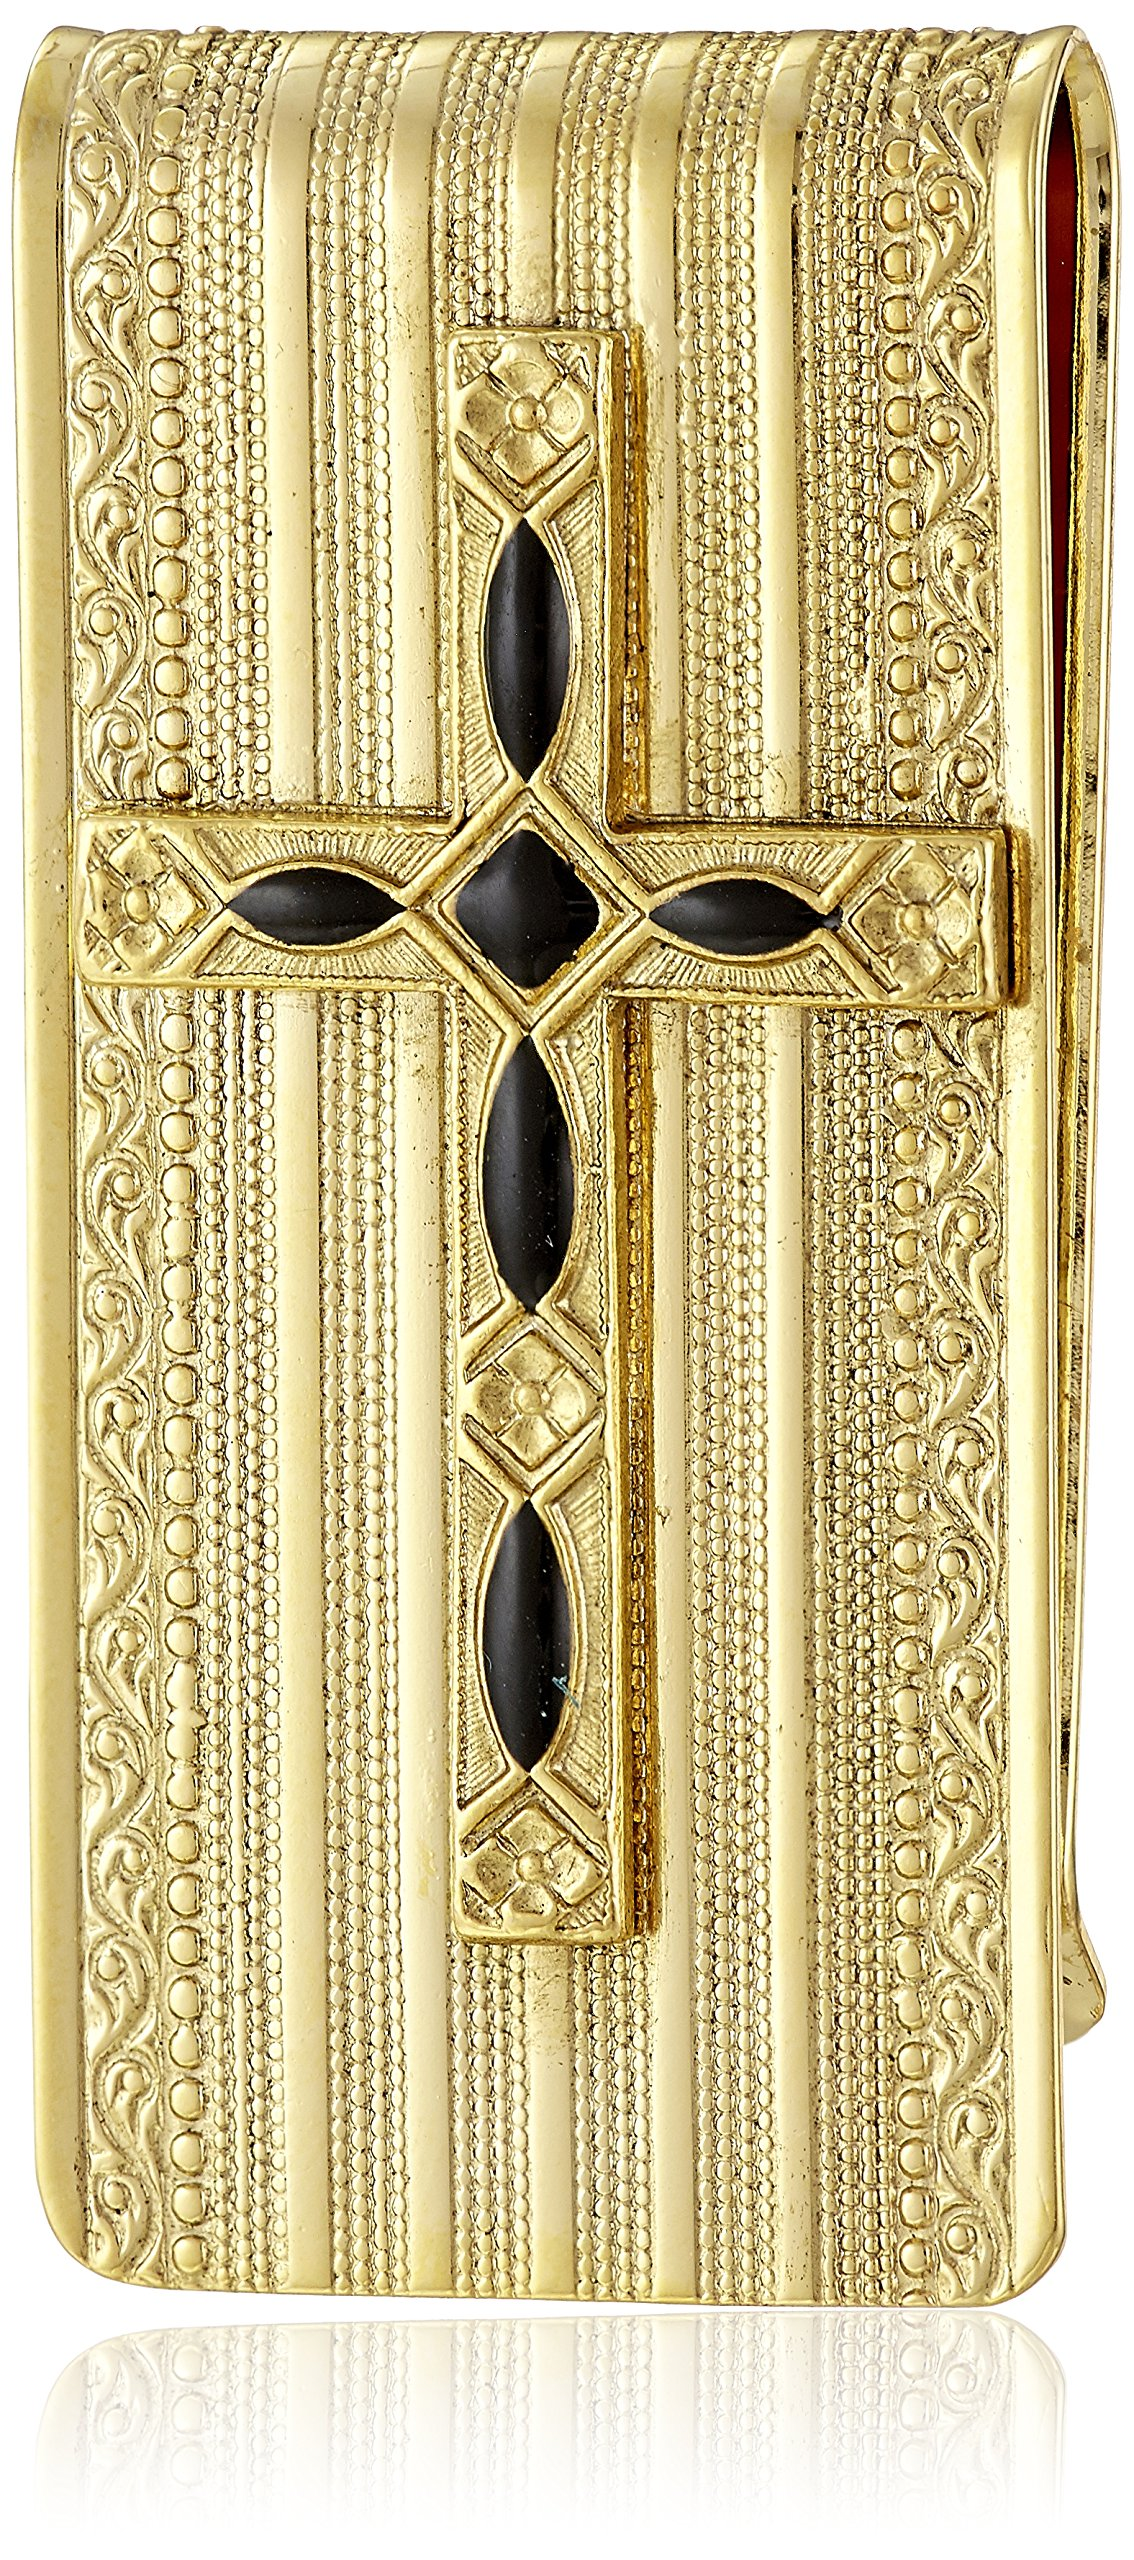 Symbols of Faith Inspirations 14k Gold-Dipped Black Cross Money Clip